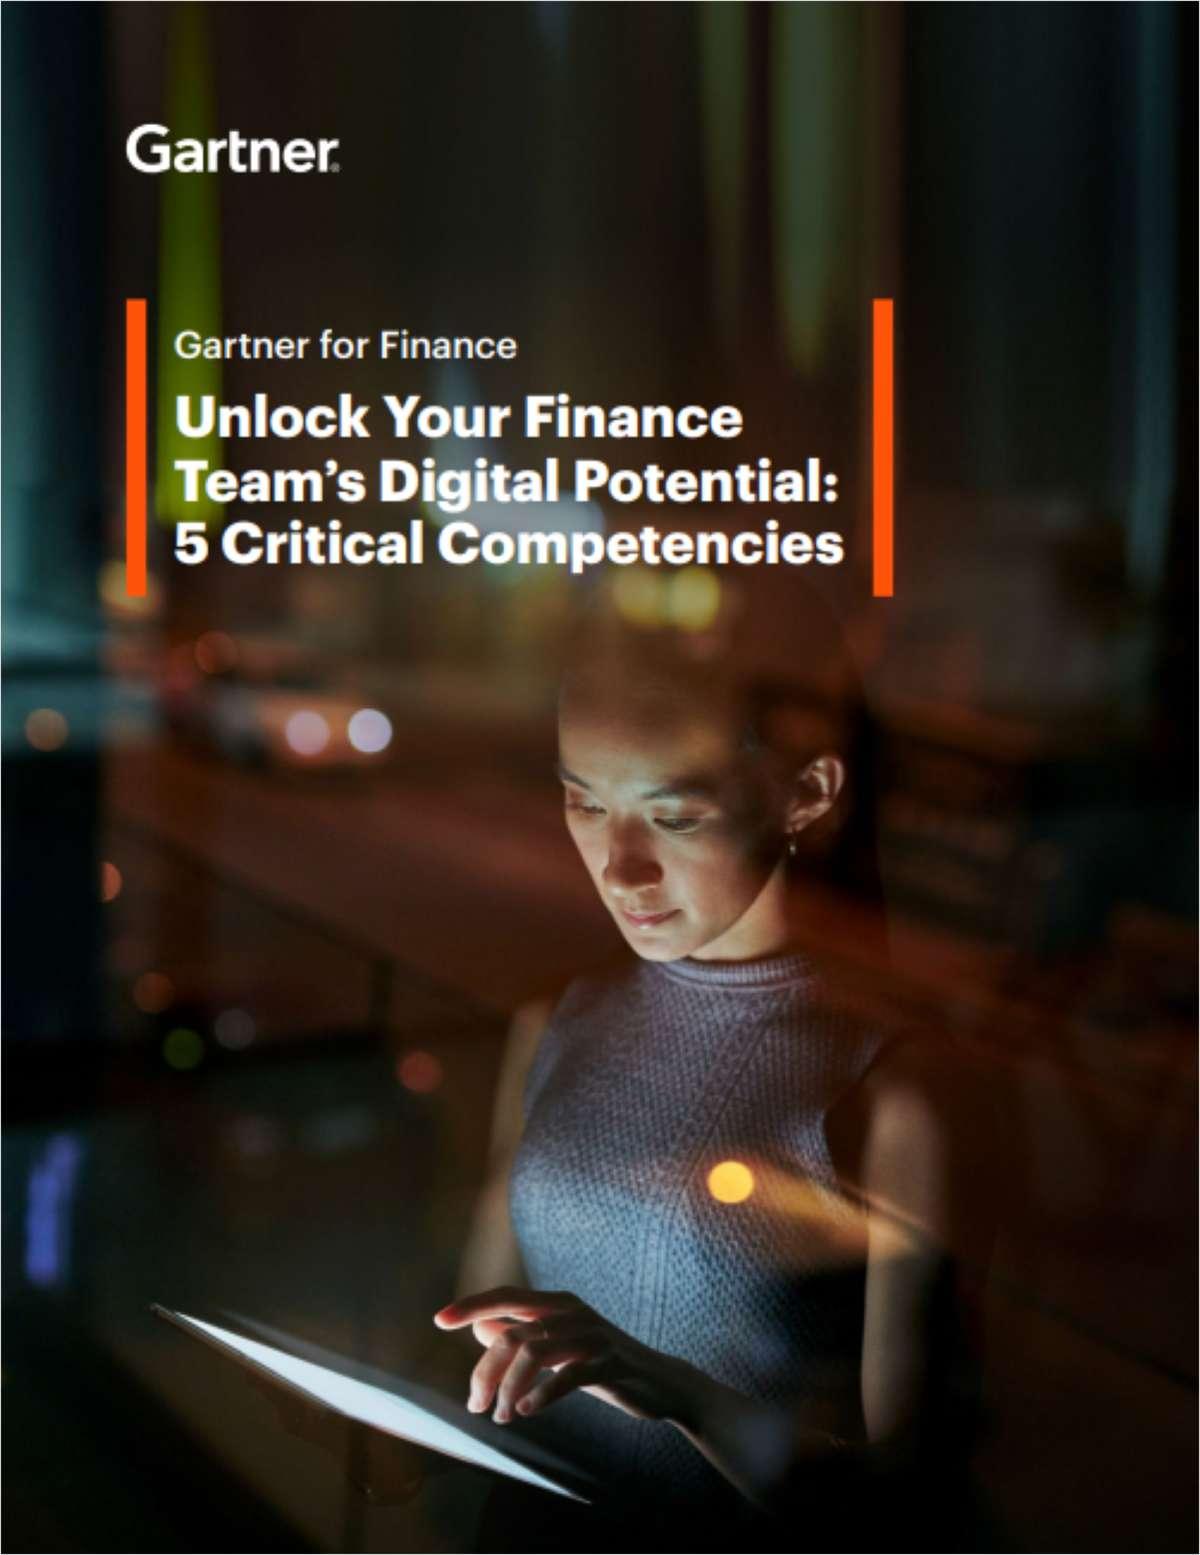 Unlock Your Finance Team's Digital Potential